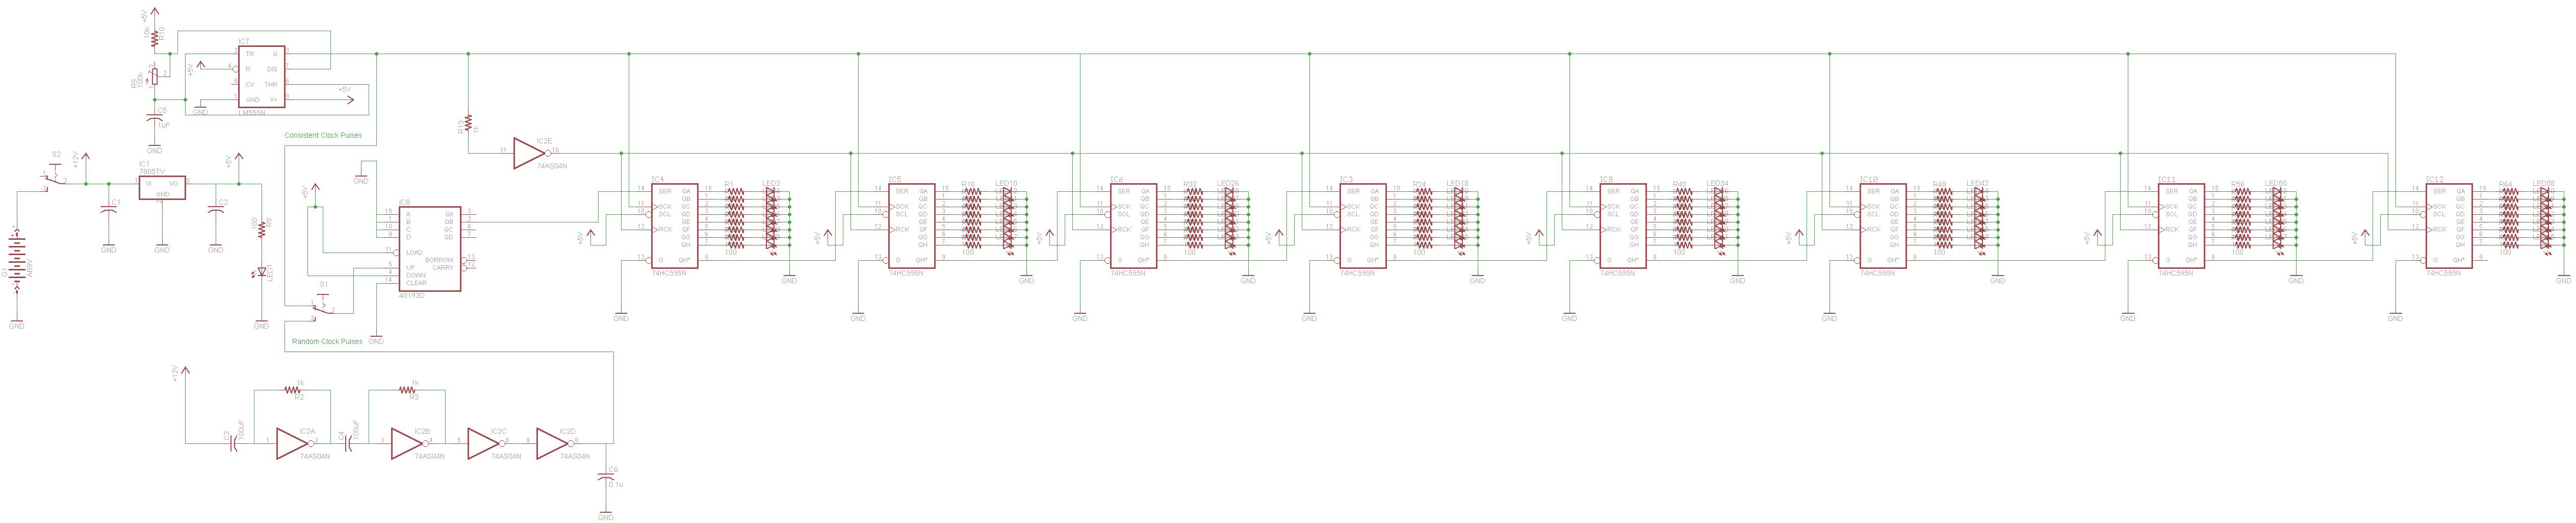 Christmas Tree Odigital Logic Schematic Pcb Layout Pyroelectro Diagram View Full